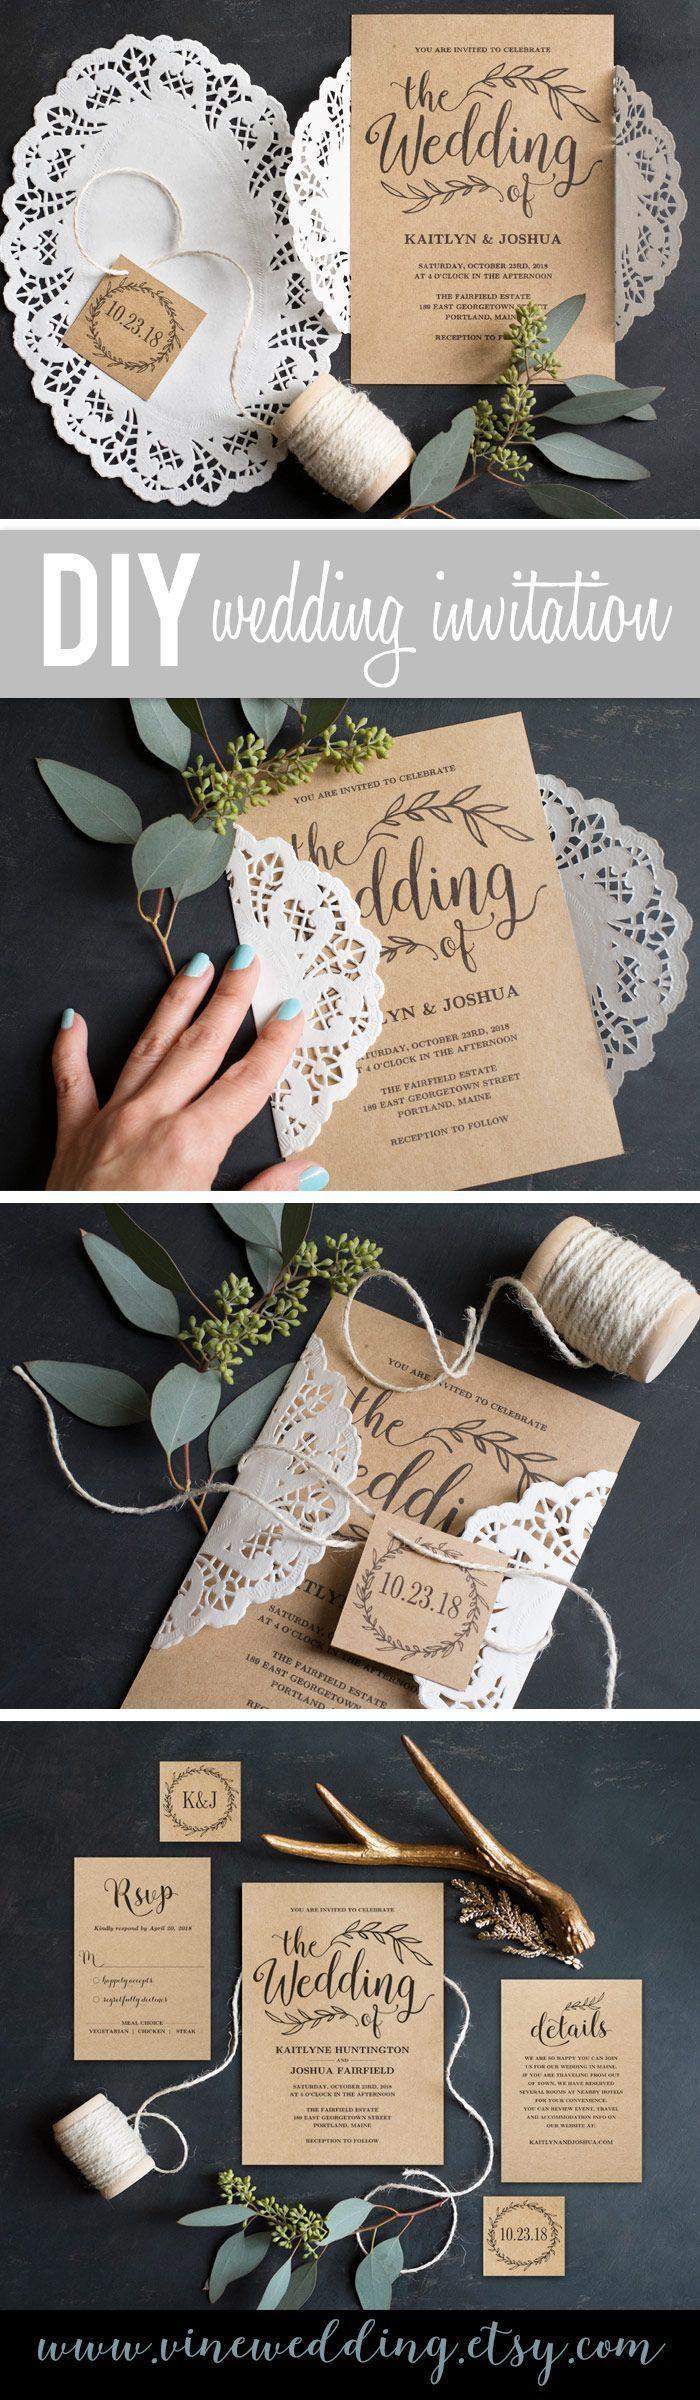 Wedding invitations wedding invitations pinterest weddings